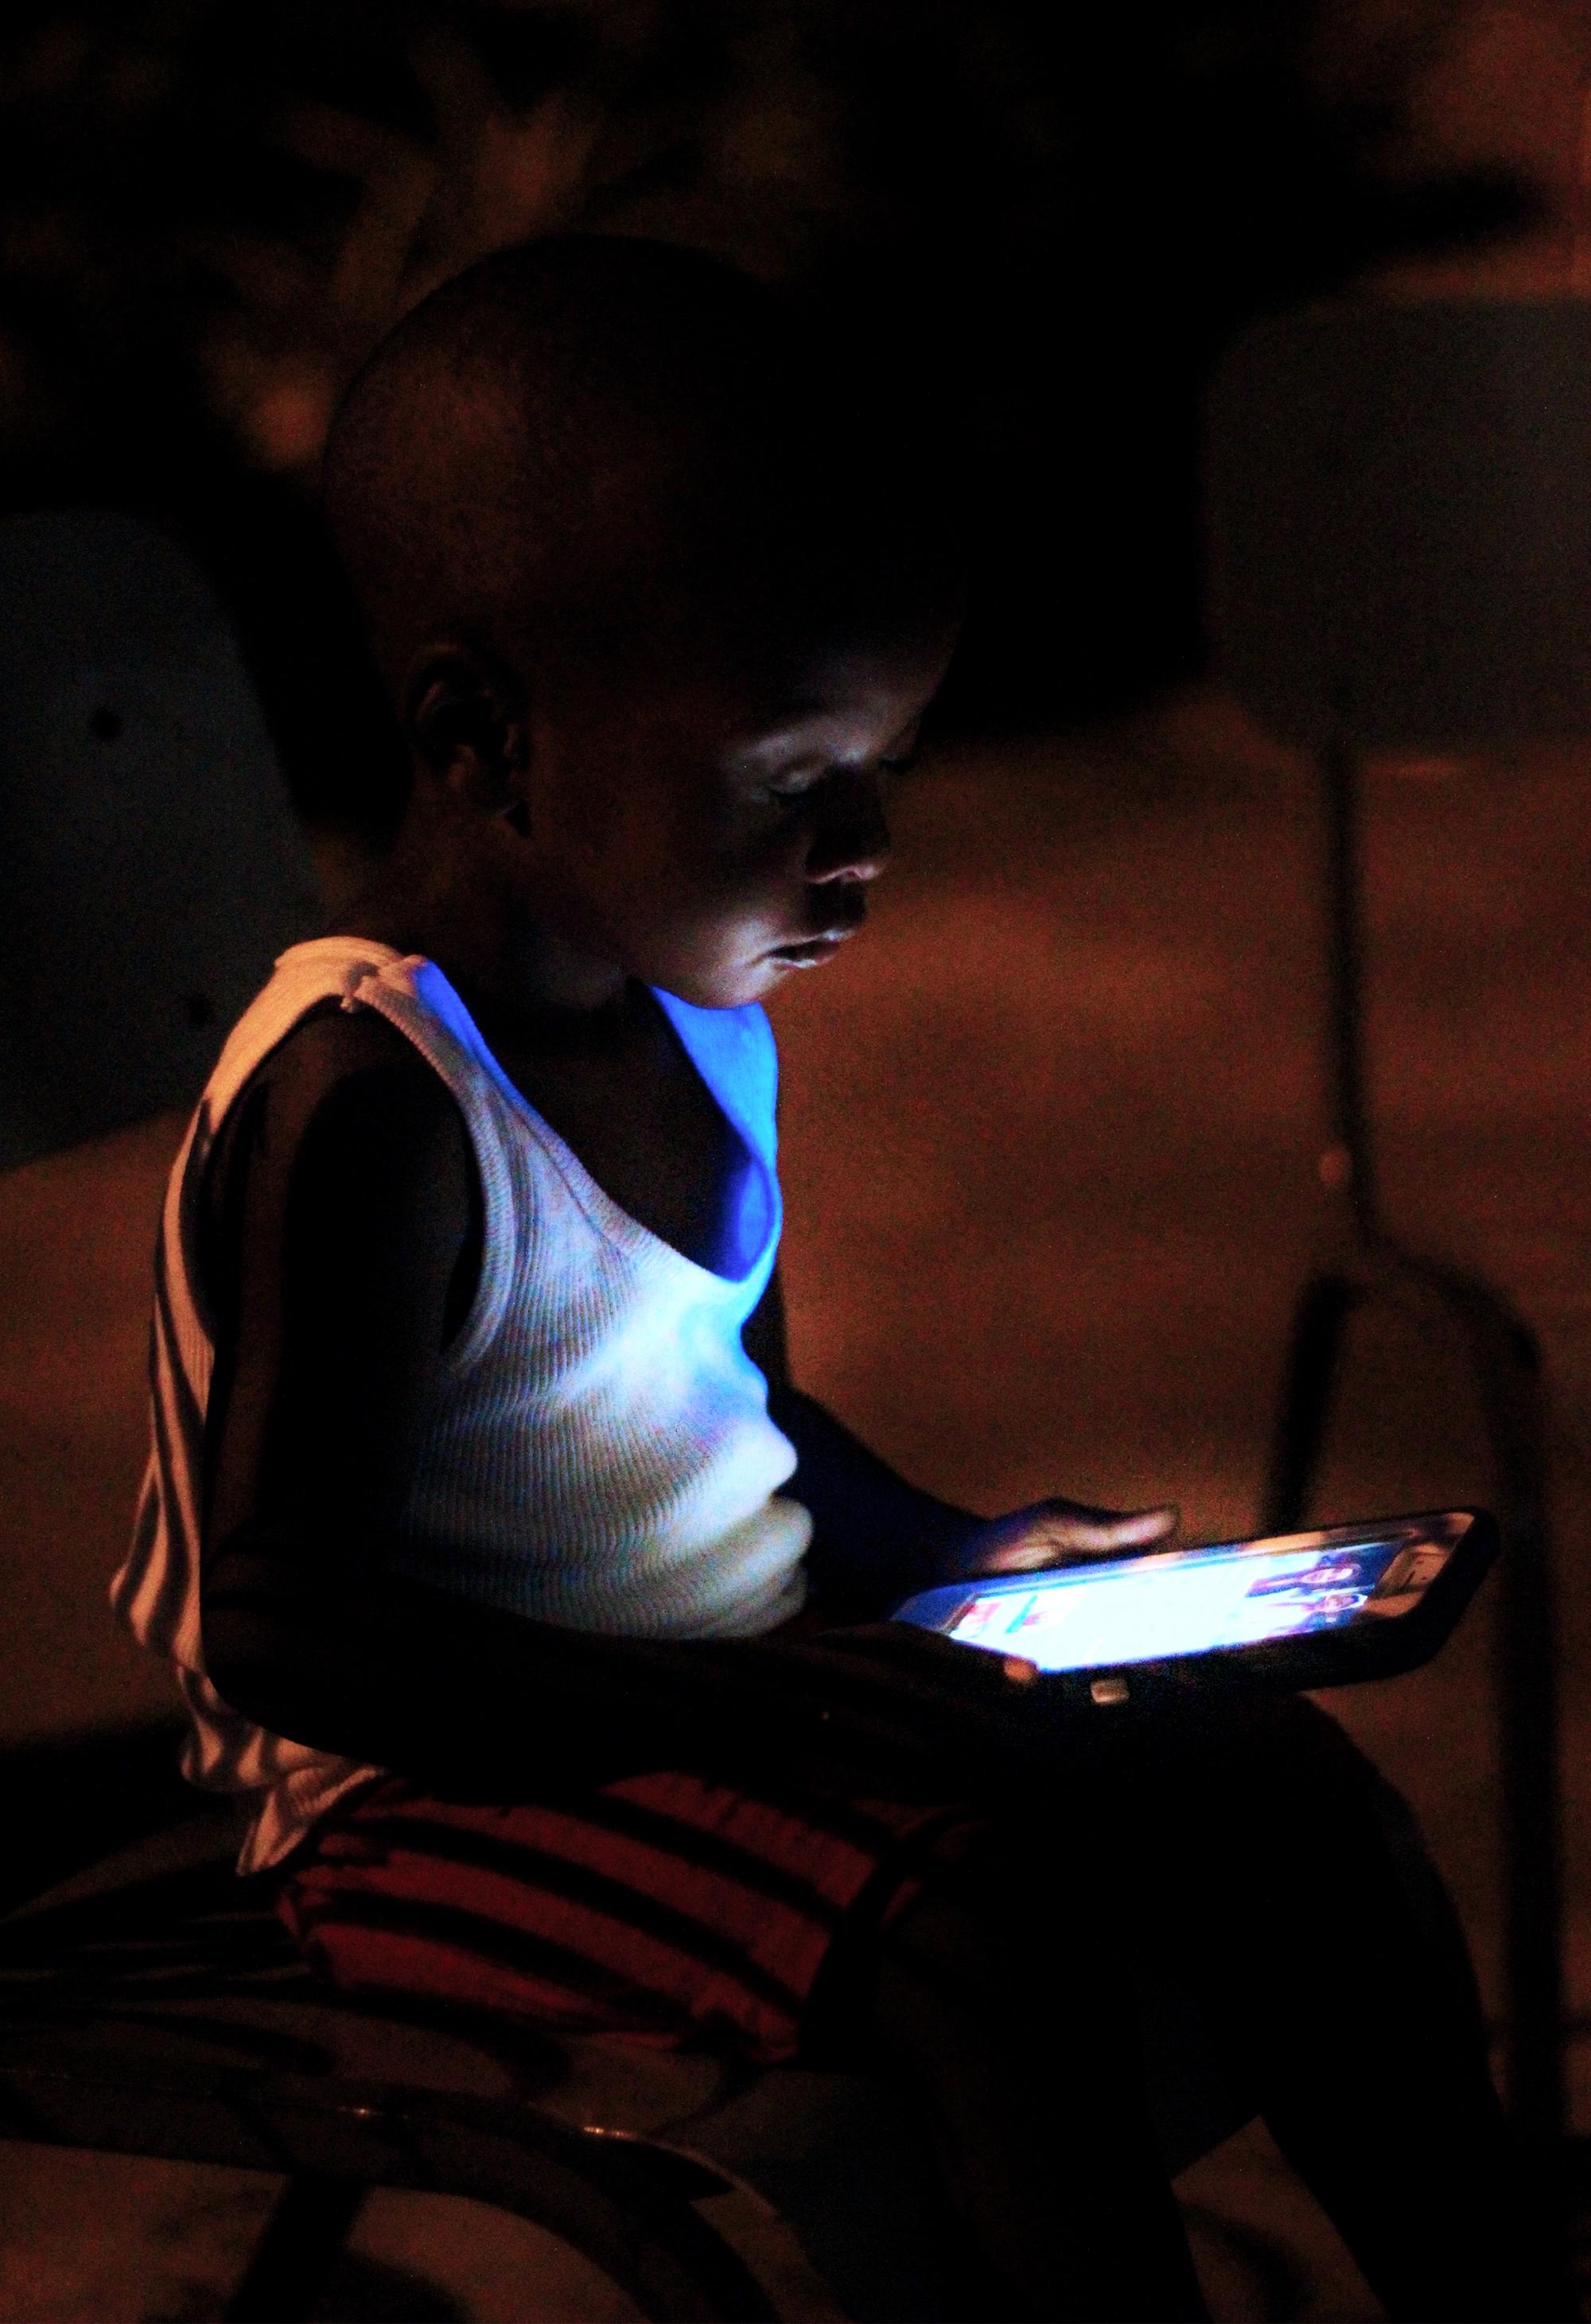 NISHLA-Design_Child_Tablet_IMG_0533.jpg